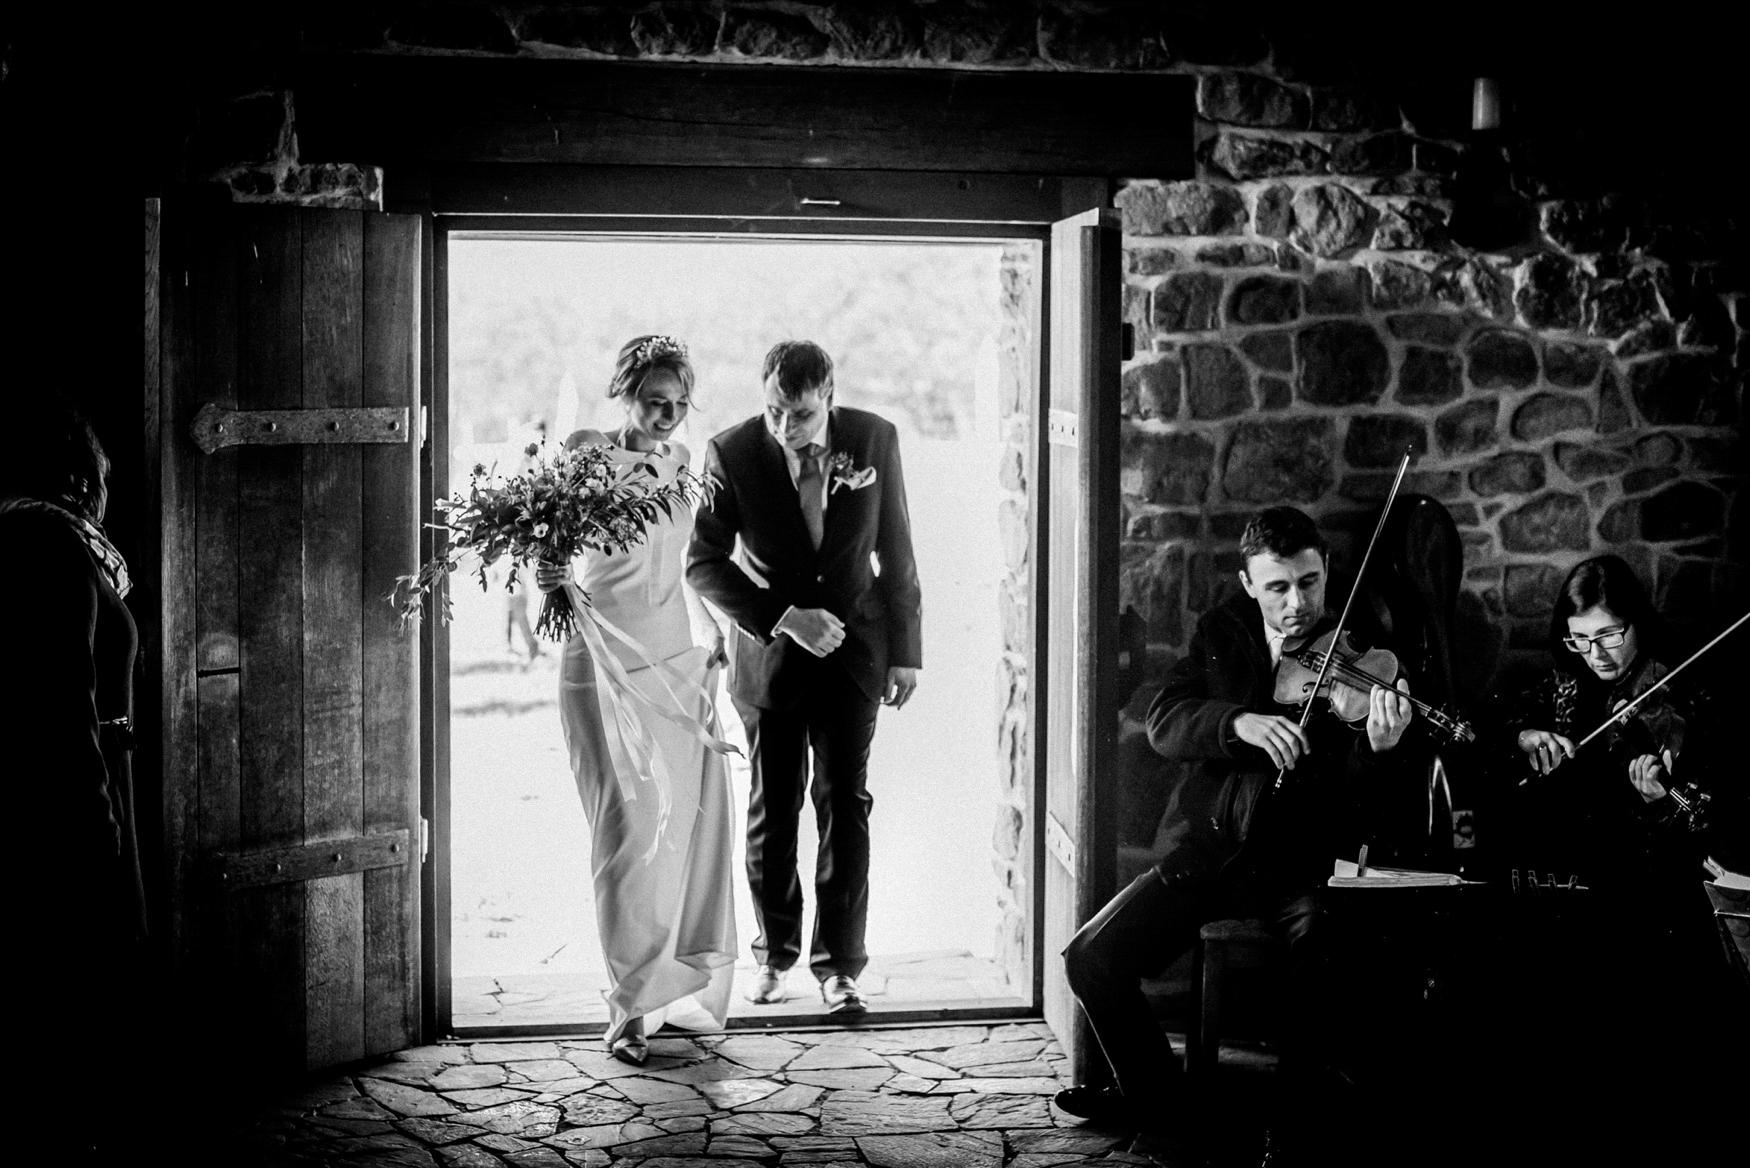 2 prague wedding photographer - boho svatba zikmundov011.jpg